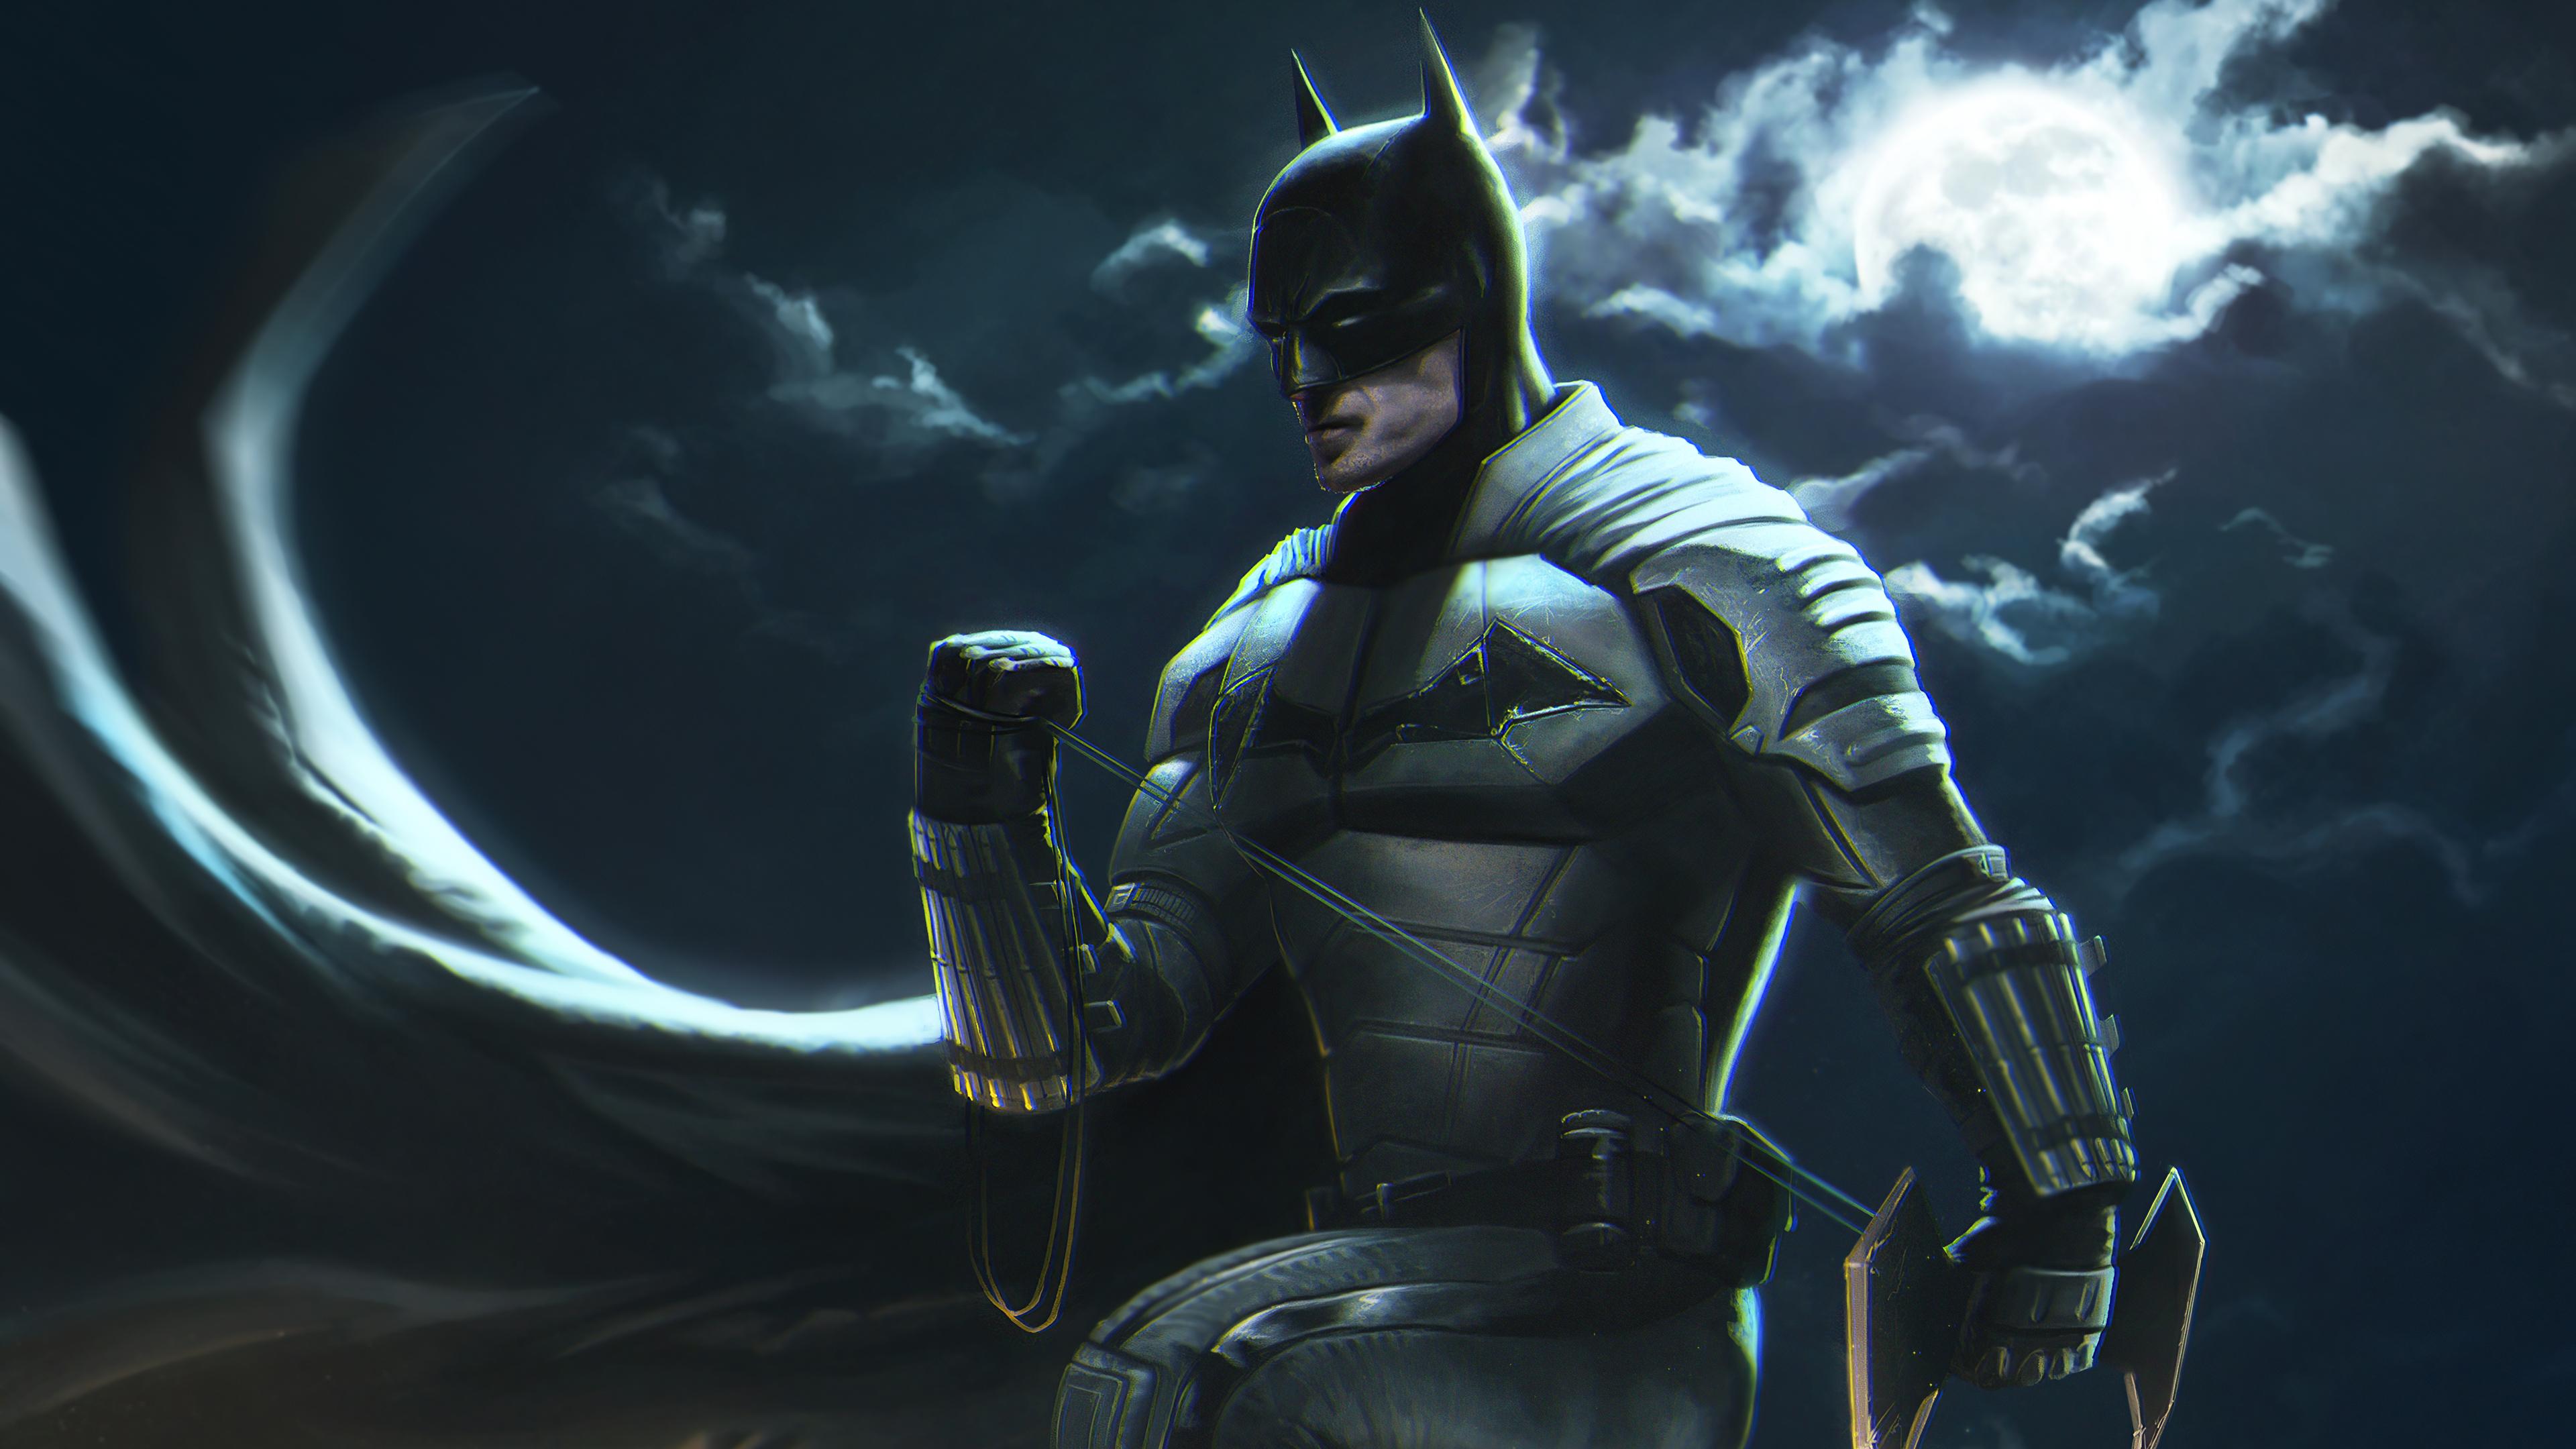 Batman Robert Pattinson 2021 4k, HD Superheroes, 4k ...